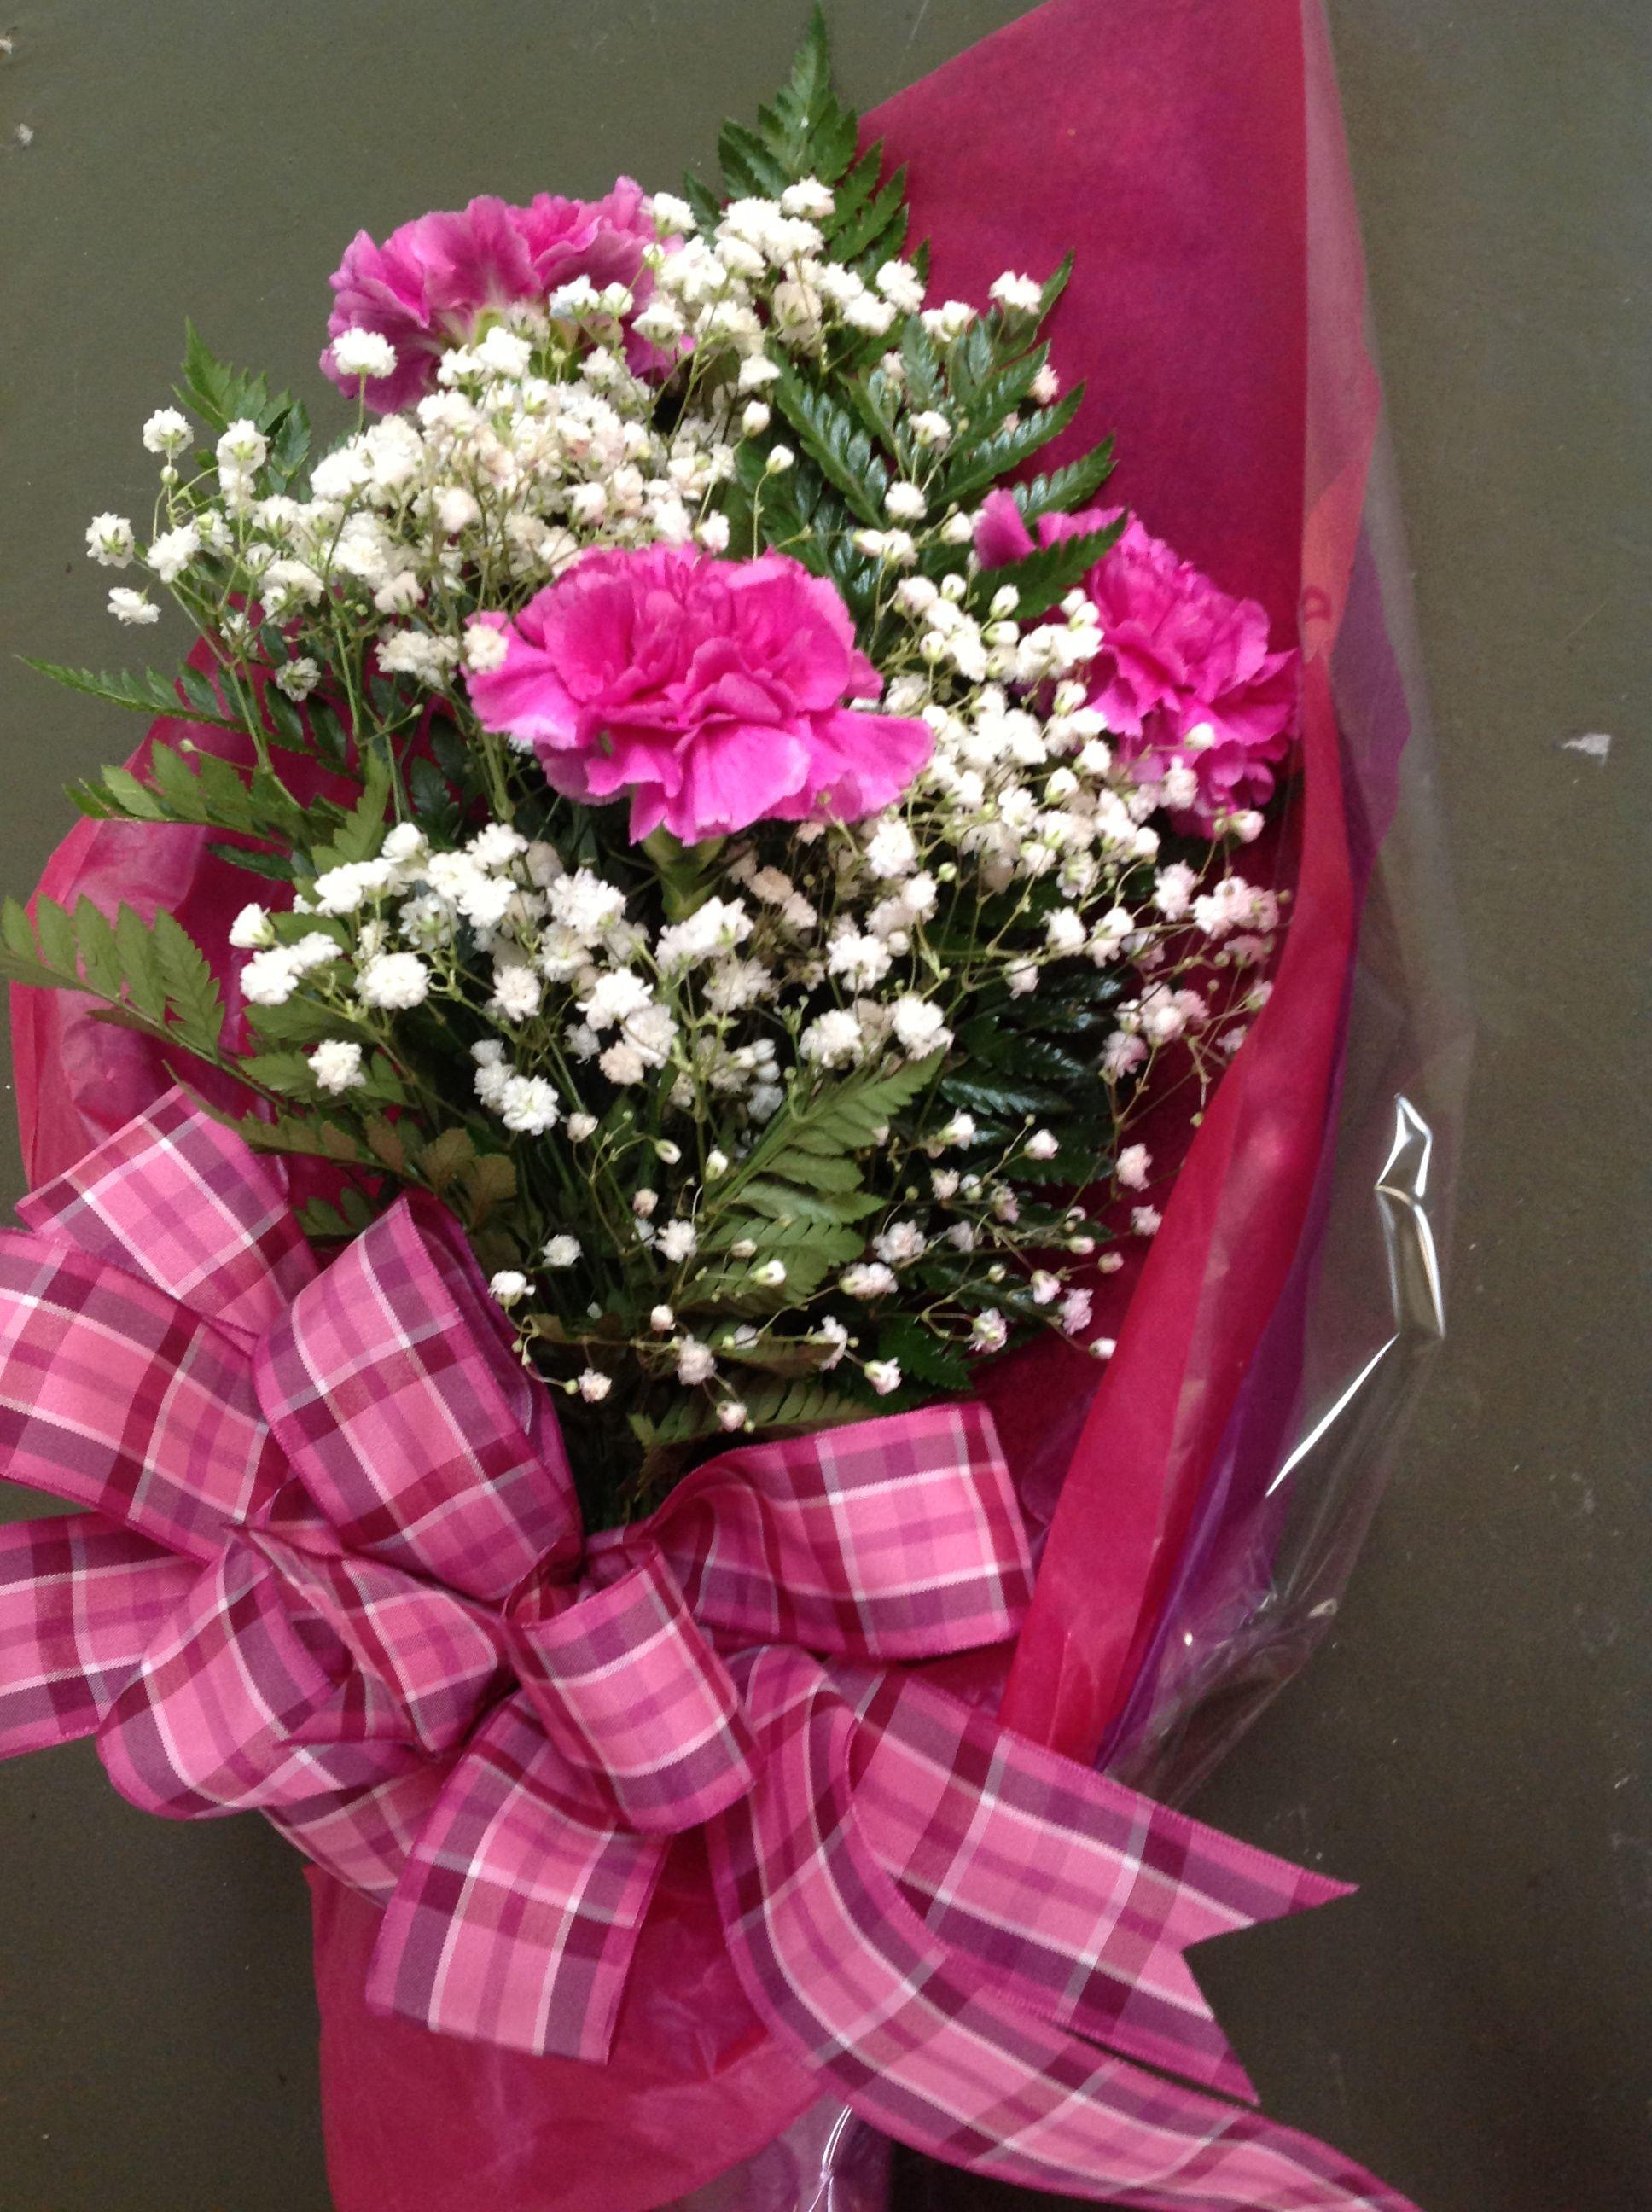 Recital Bouquet Pink Carnation Bloomersflowers Pink Carnations Flower Delivery Bouquet